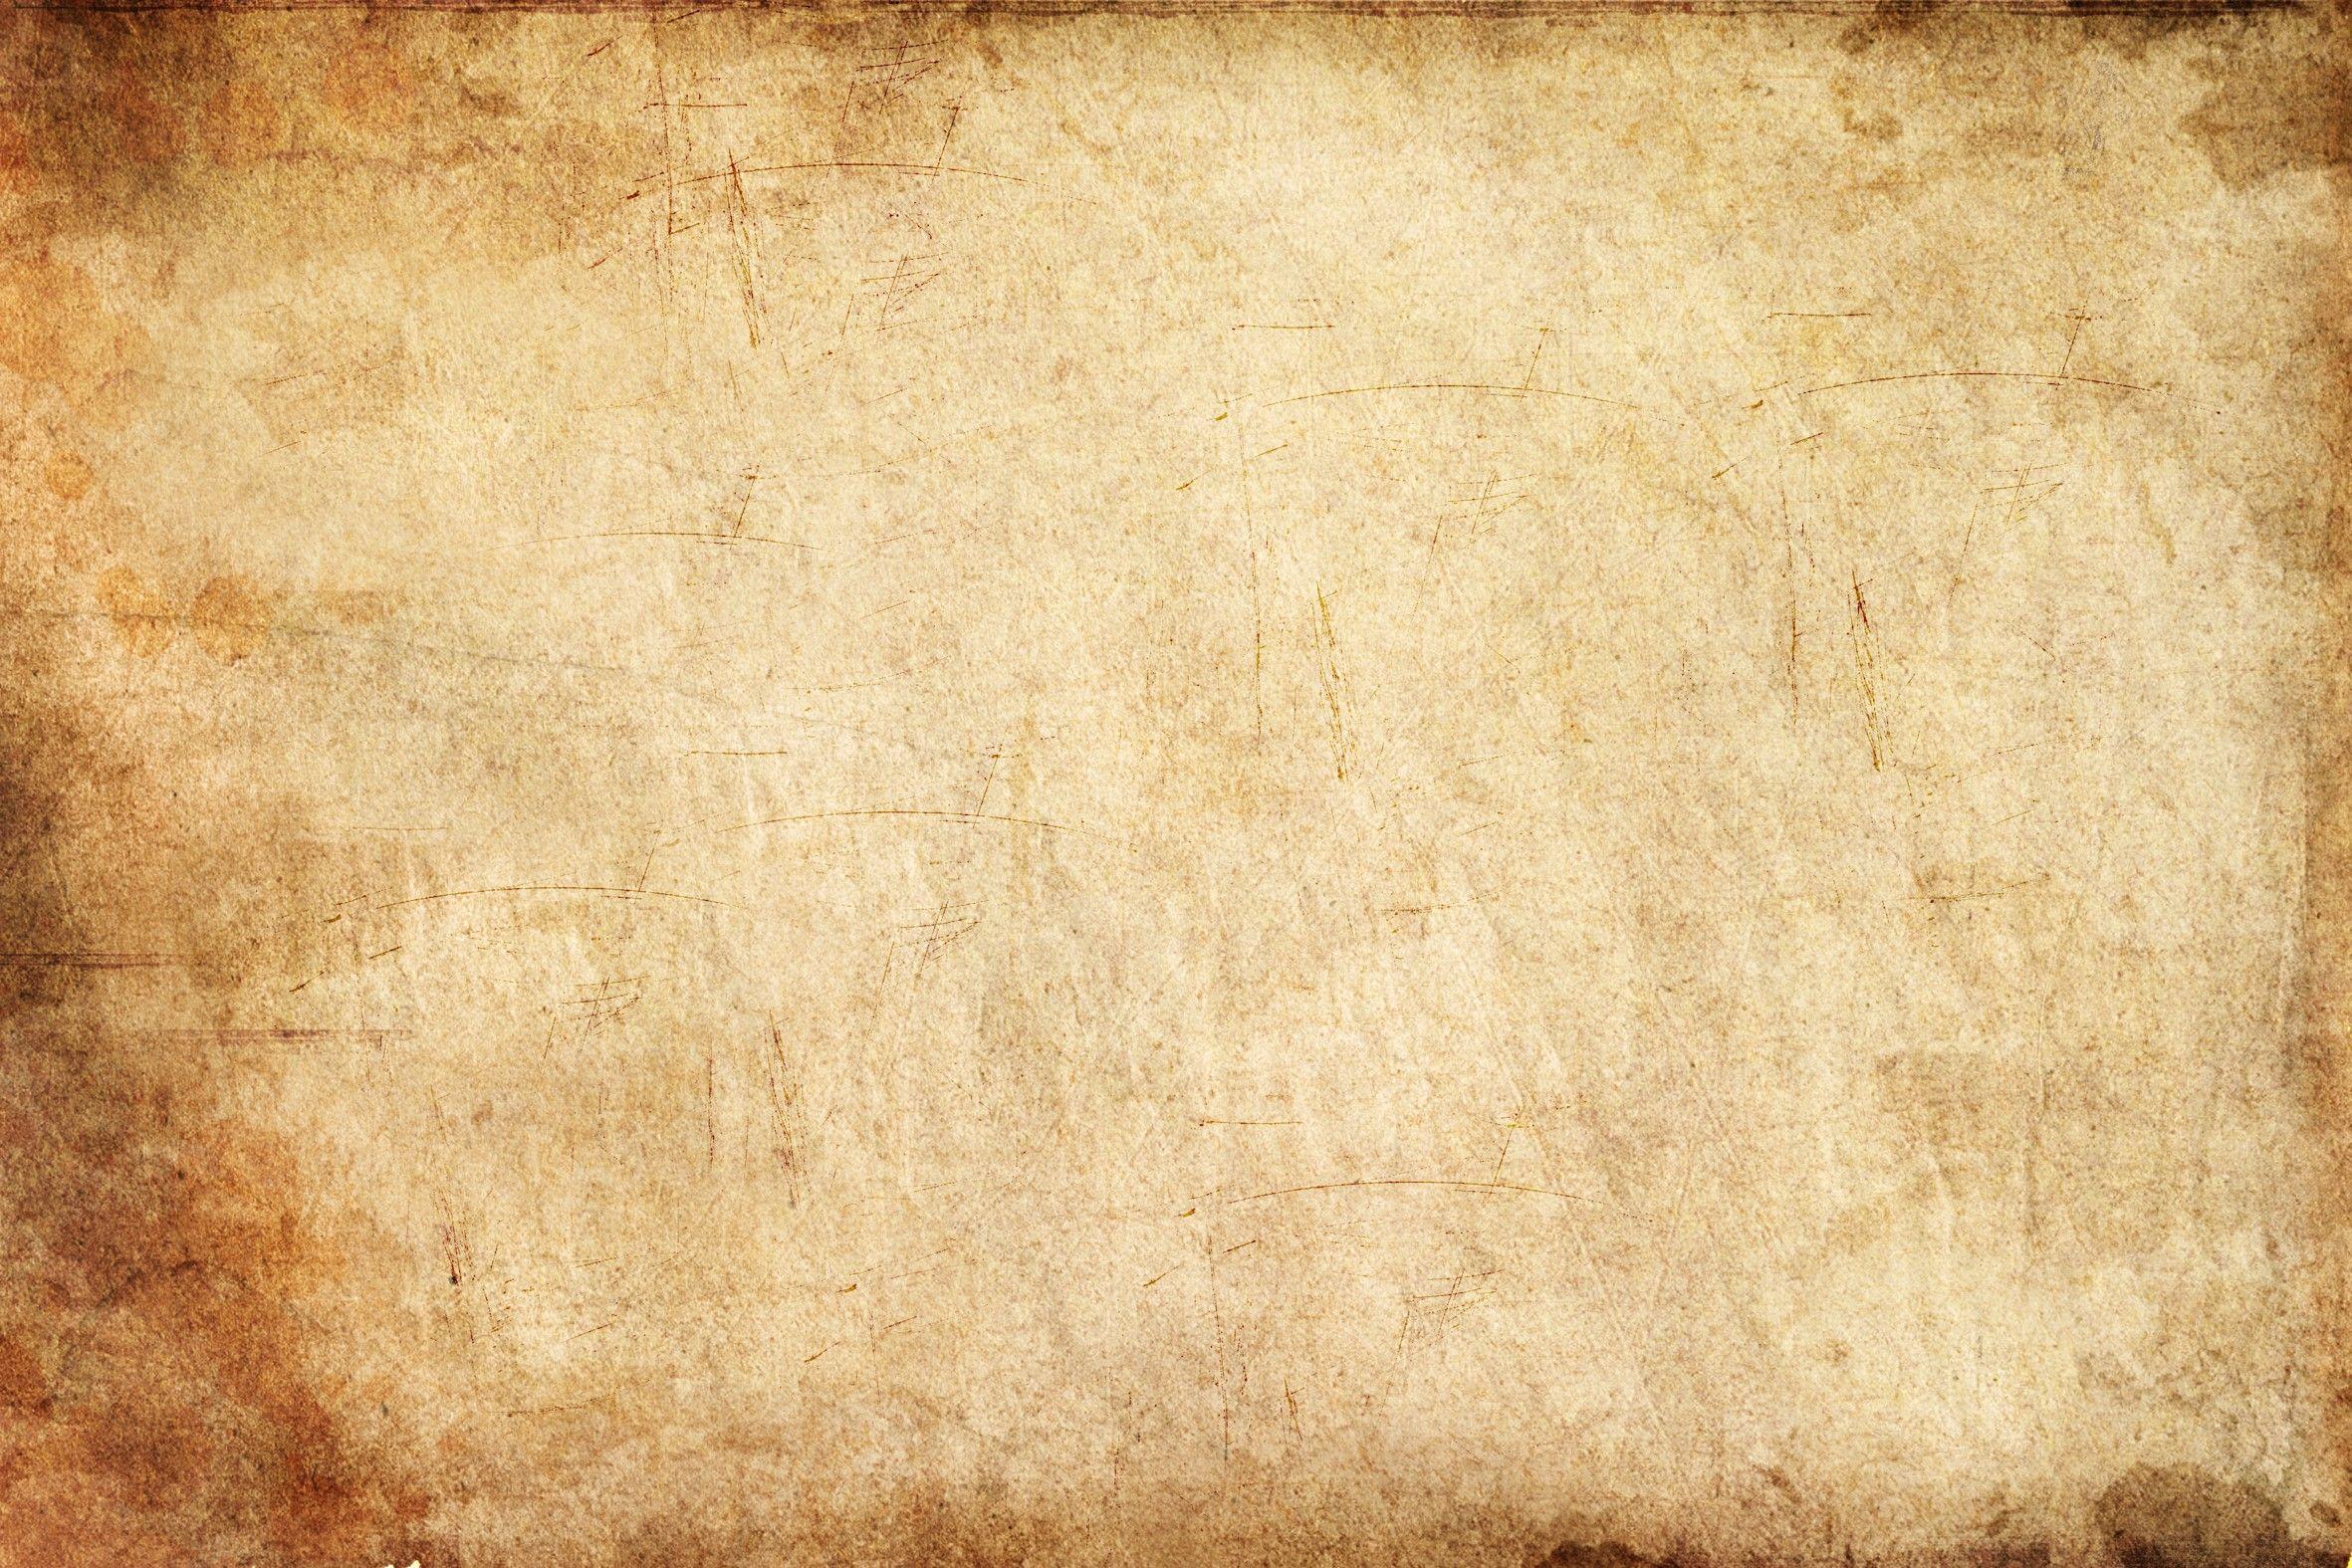 Scroll Texture (G. Snow, 2015)